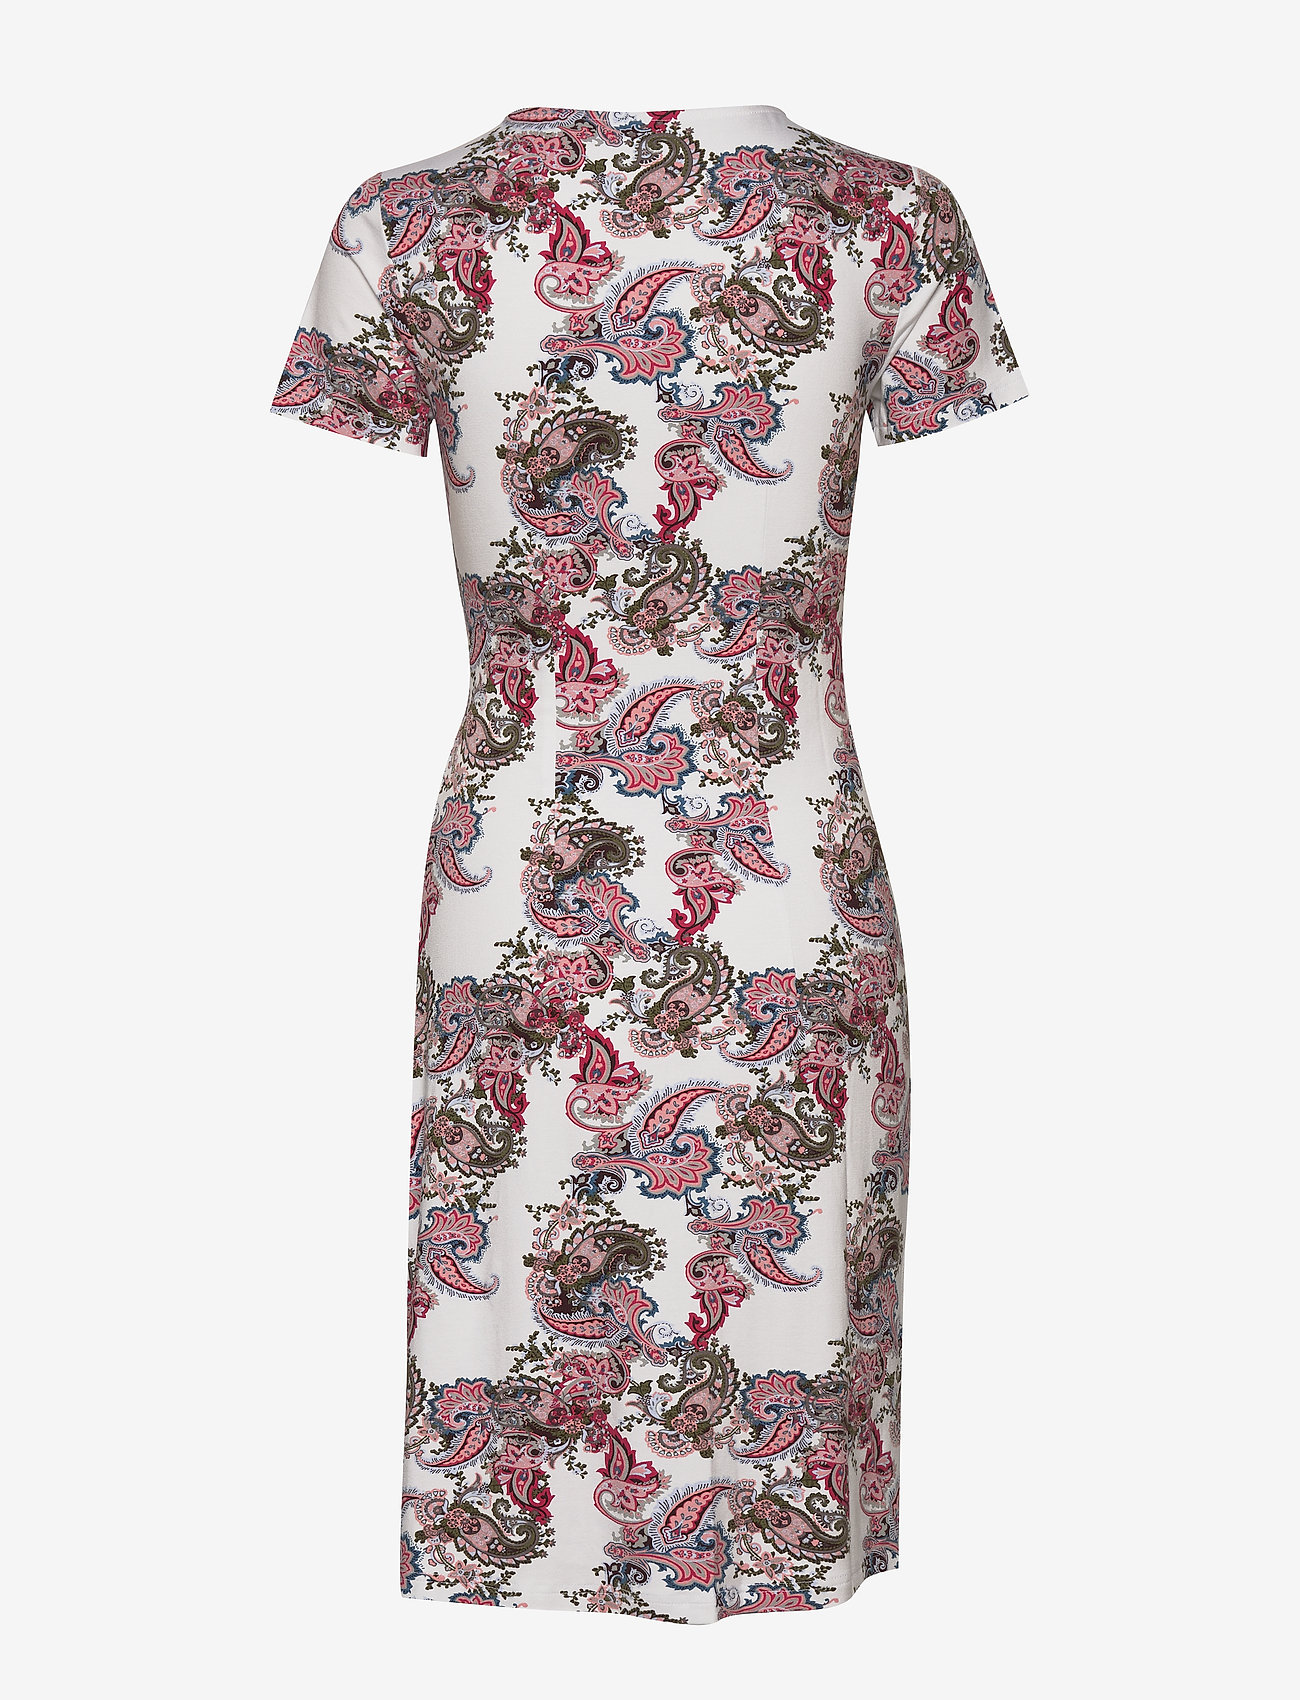 Brandtex Dress-jersey - Dresses